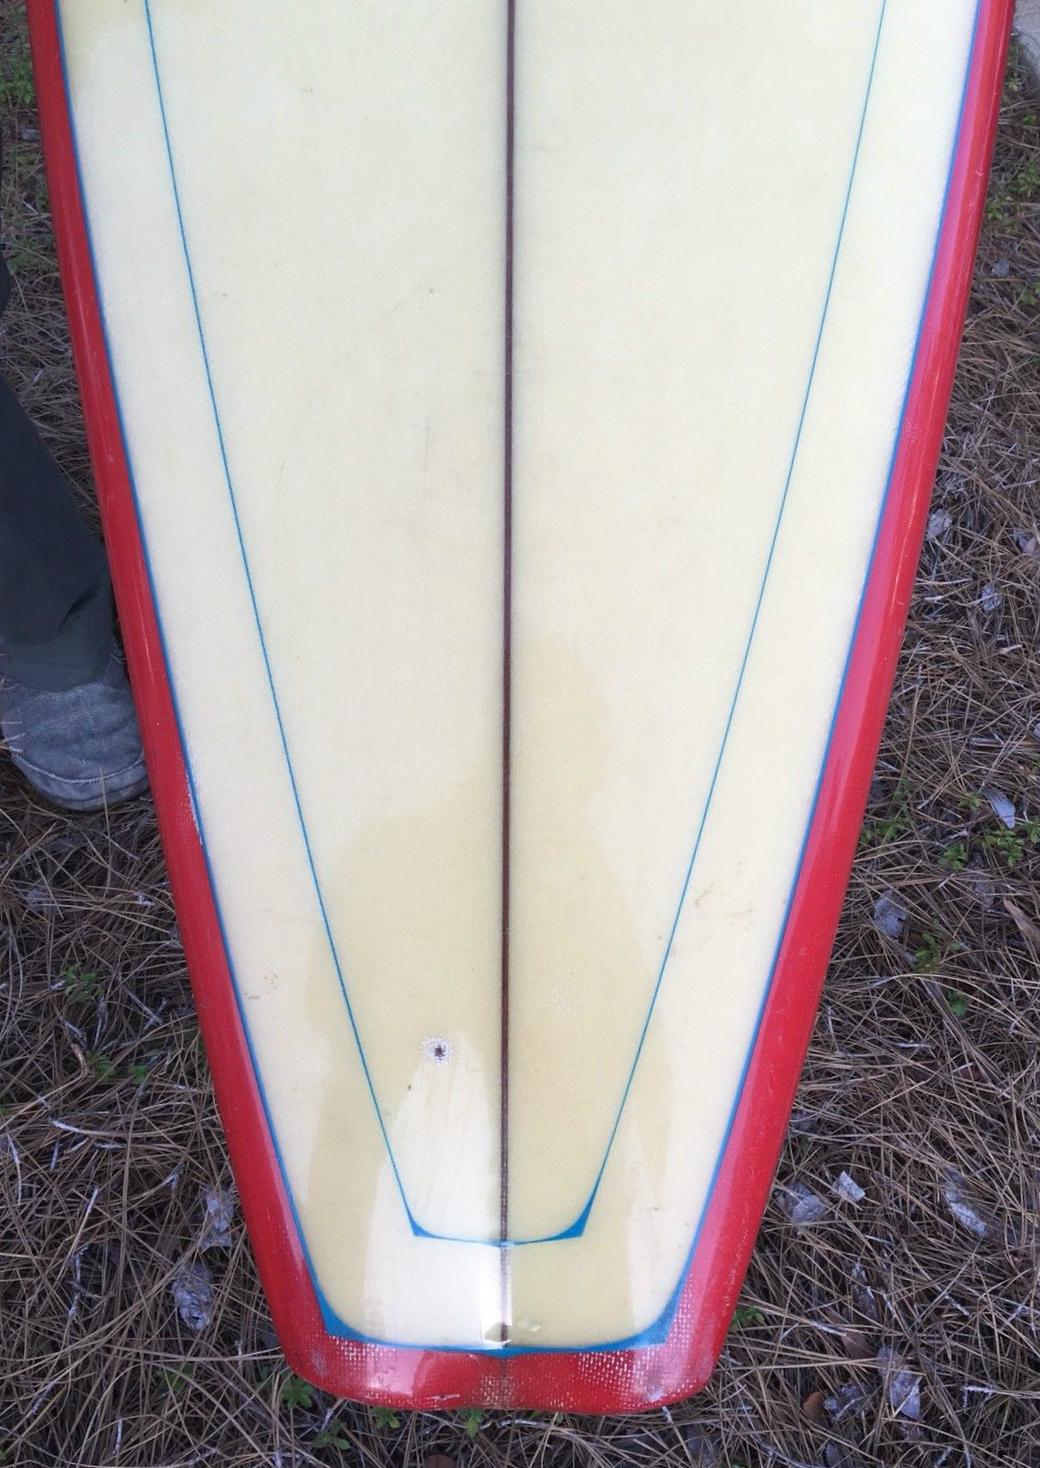 Bing Bonzer Surfboard Bottom